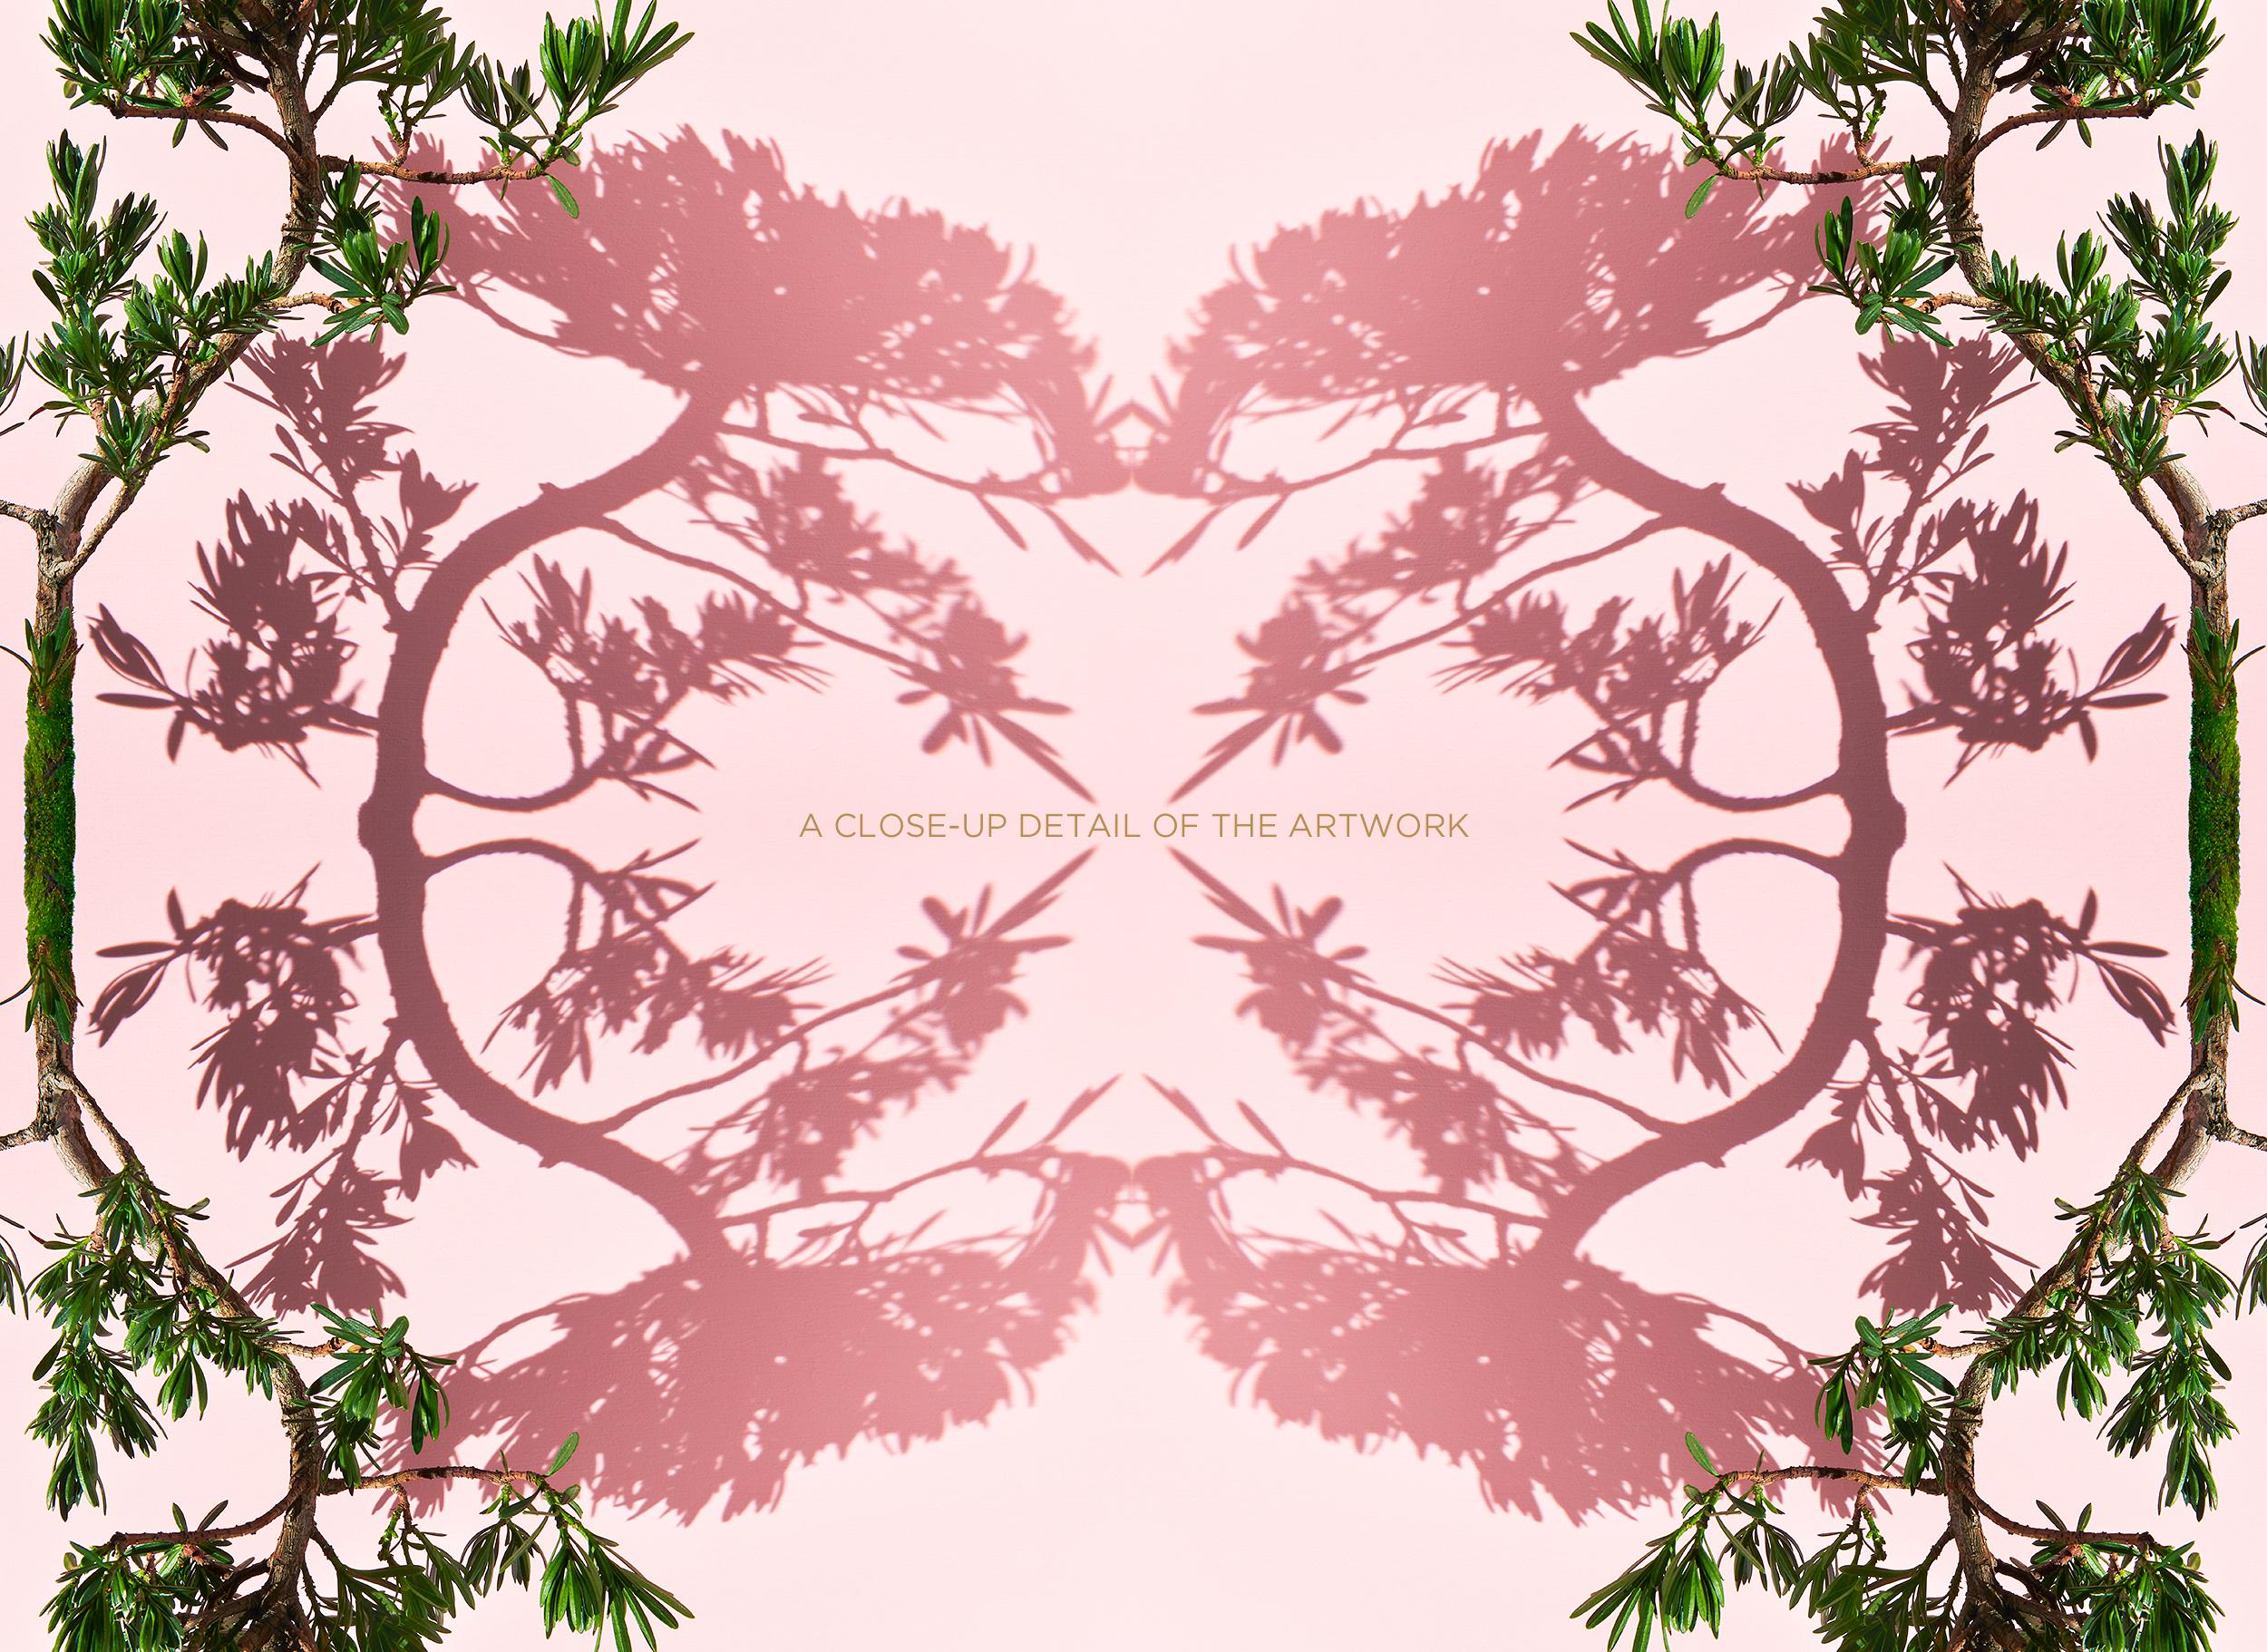 "<a href=""https://mrsteel.london/shop/bonsai/ "">REVEAL DETAILS / BUY</a>"